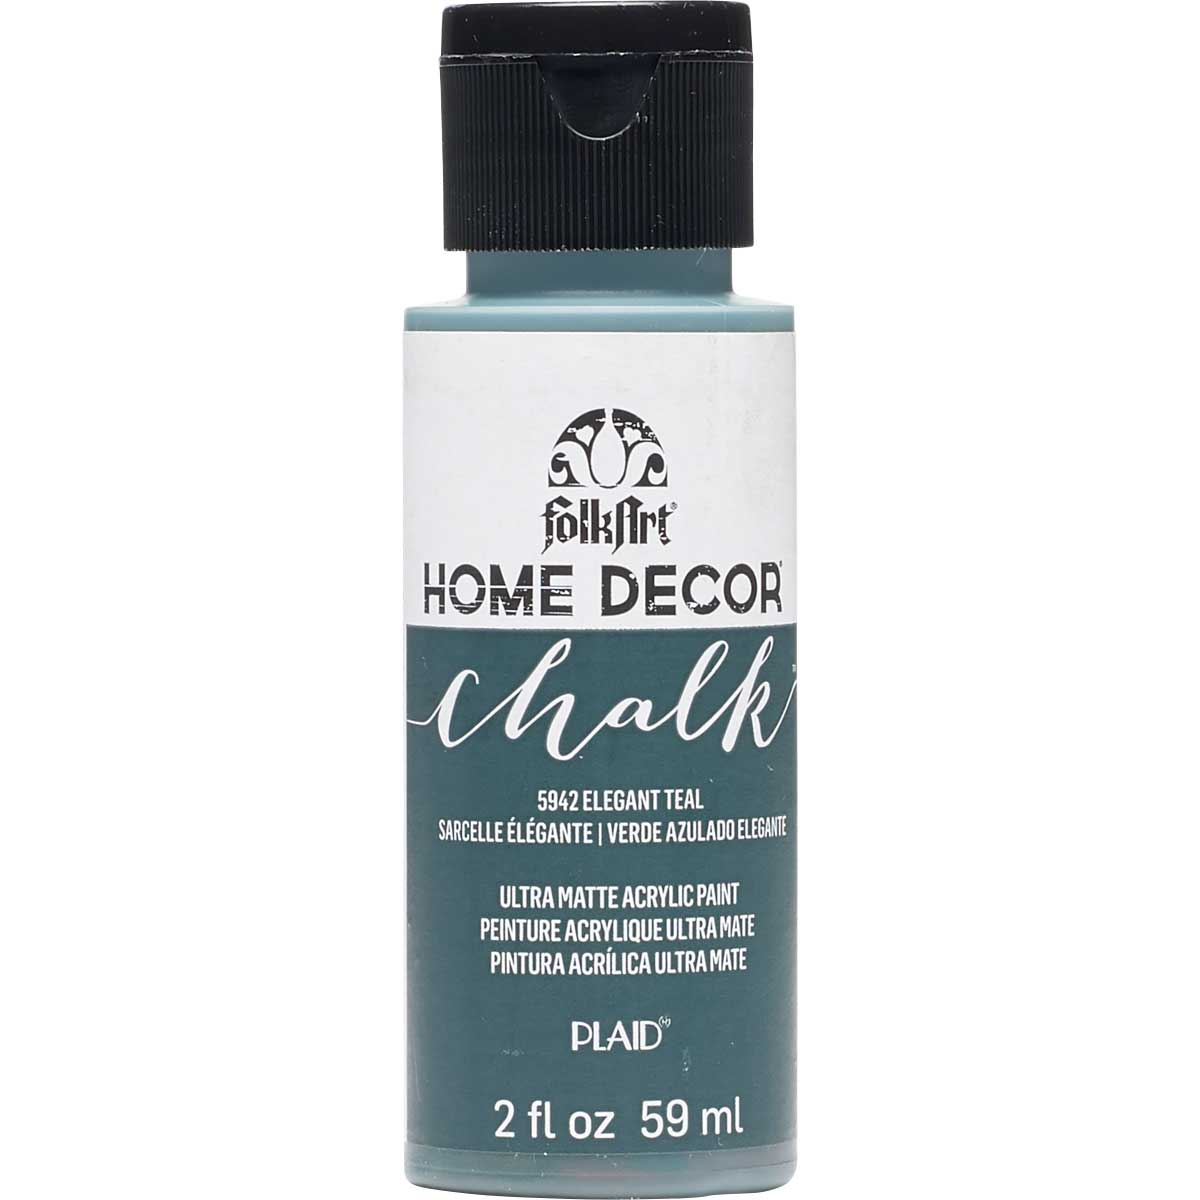 FolkArt ® Home Decor™ Chalk - Elegant Teal, 2 oz.